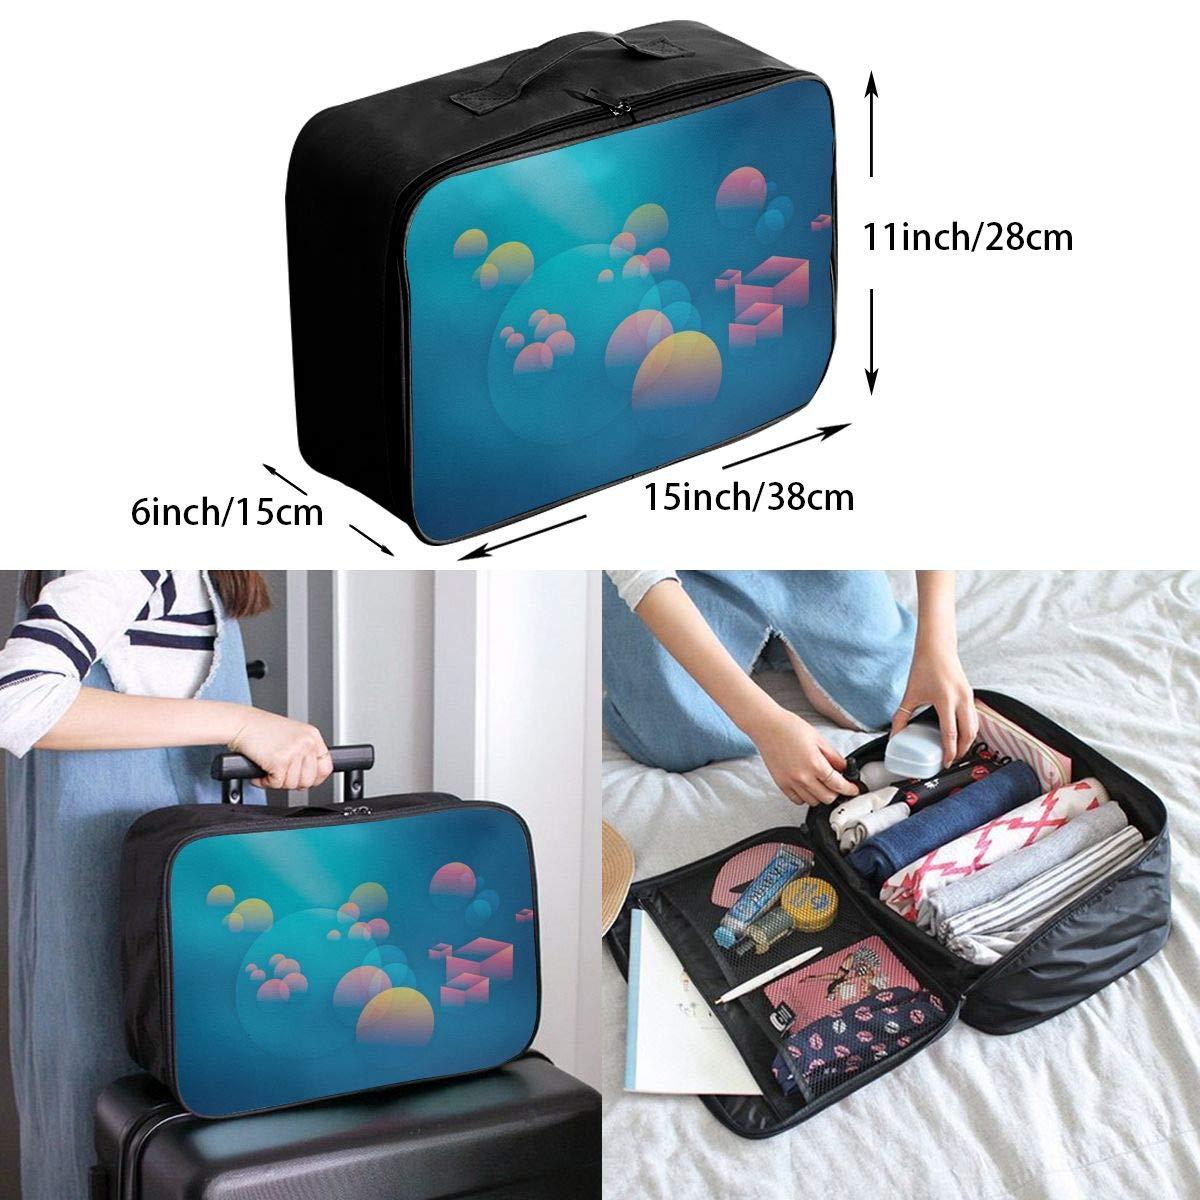 Travel Luggage Duffle Bag Lightweight Portable Handbag Circles Cubes Large Capacity Waterproof Foldable Storage Tote